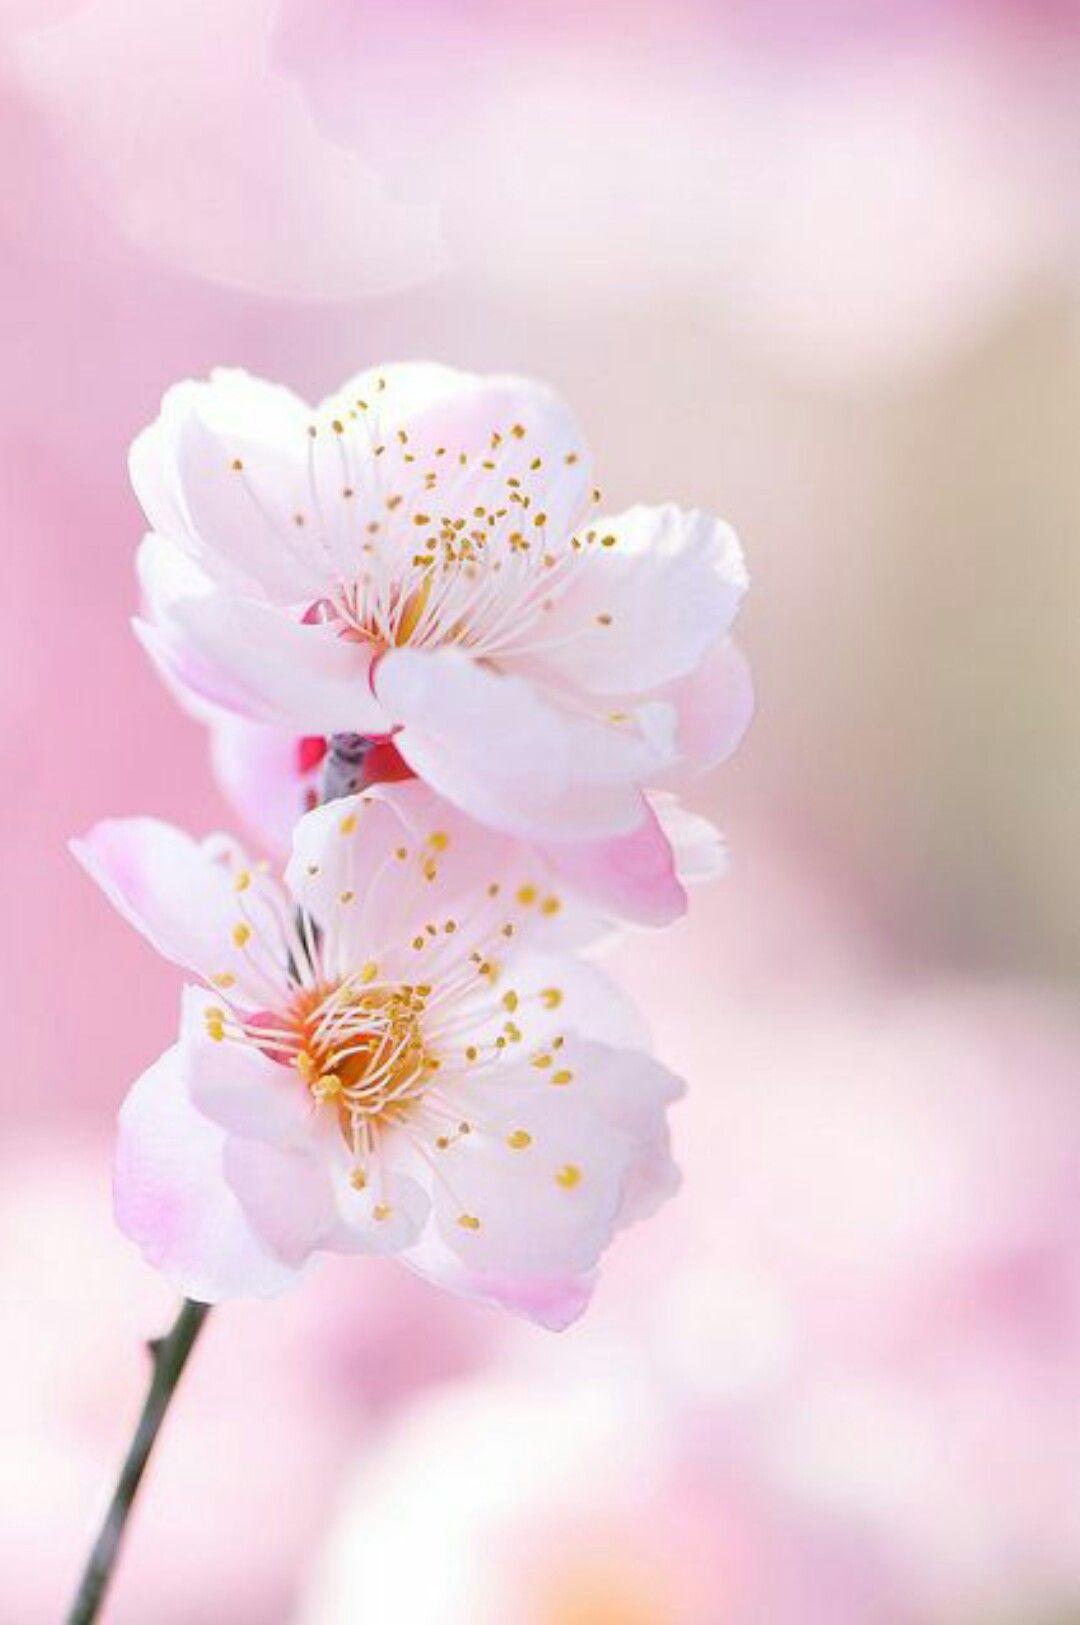 Pin Oleh Nauma Dwi Di Beatiful And Clourful Flowers Ilustrasi Bunga Sakura Ilustrasi Bunga Fotografi Bunga